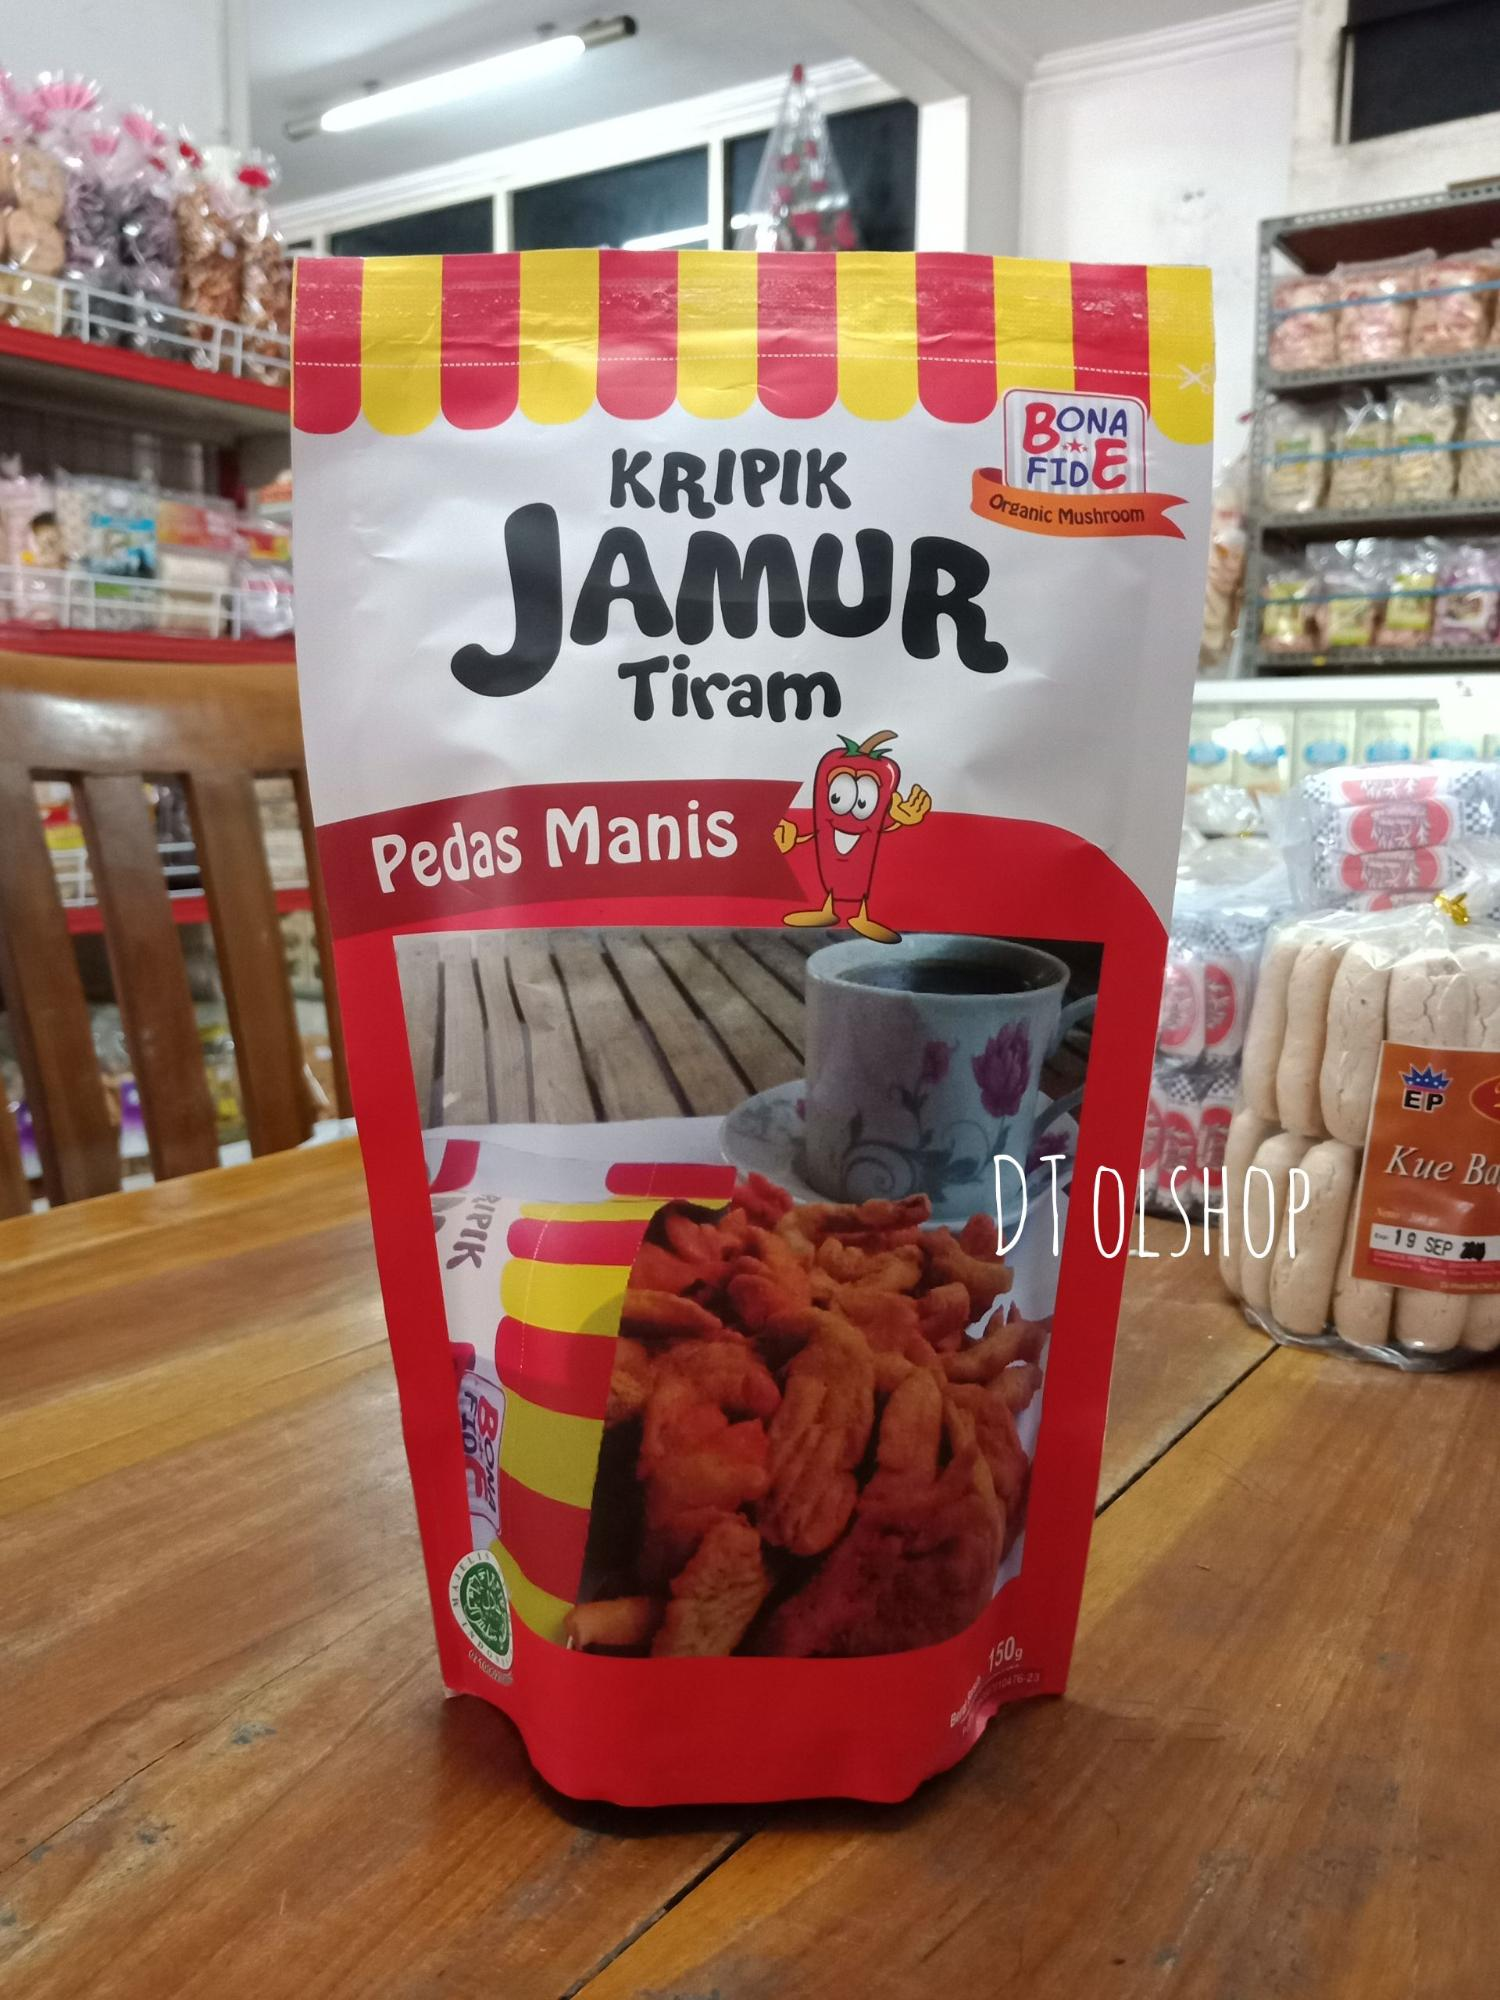 Kripik / Keripik Jamur Tiram Cemilan/ Camilan Sehat Vegetarian